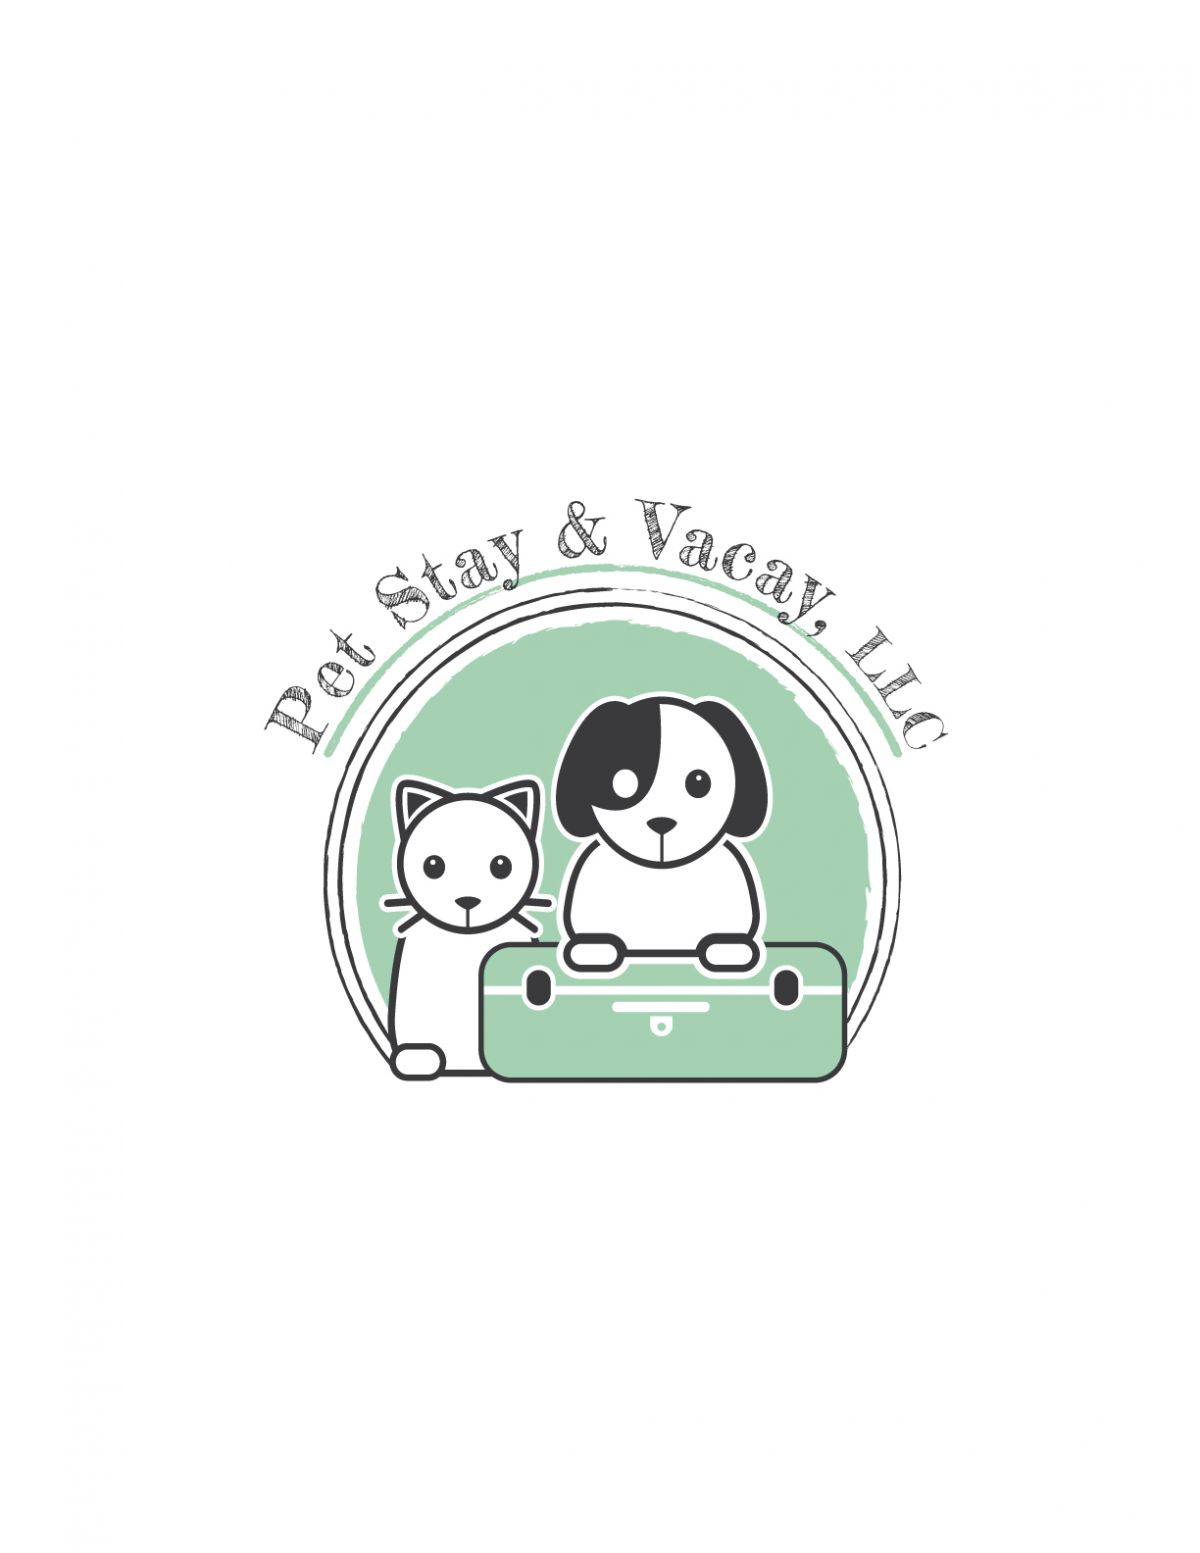 Pet Stay & Vacay, LLC